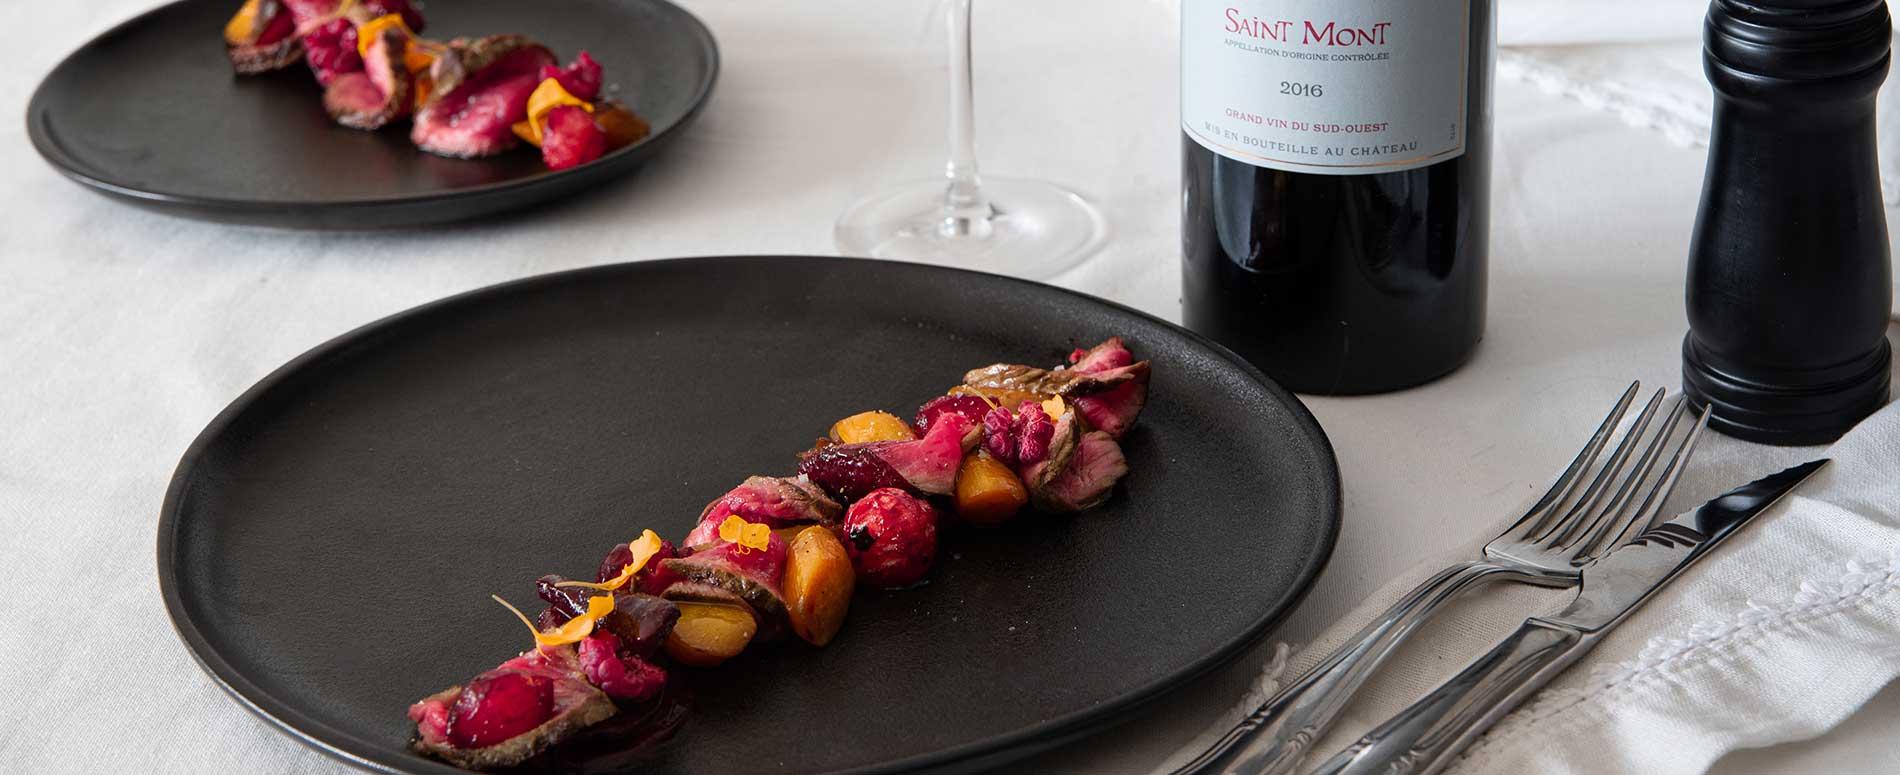 Tataki de boeuf et vin rouge Château de Sabazan